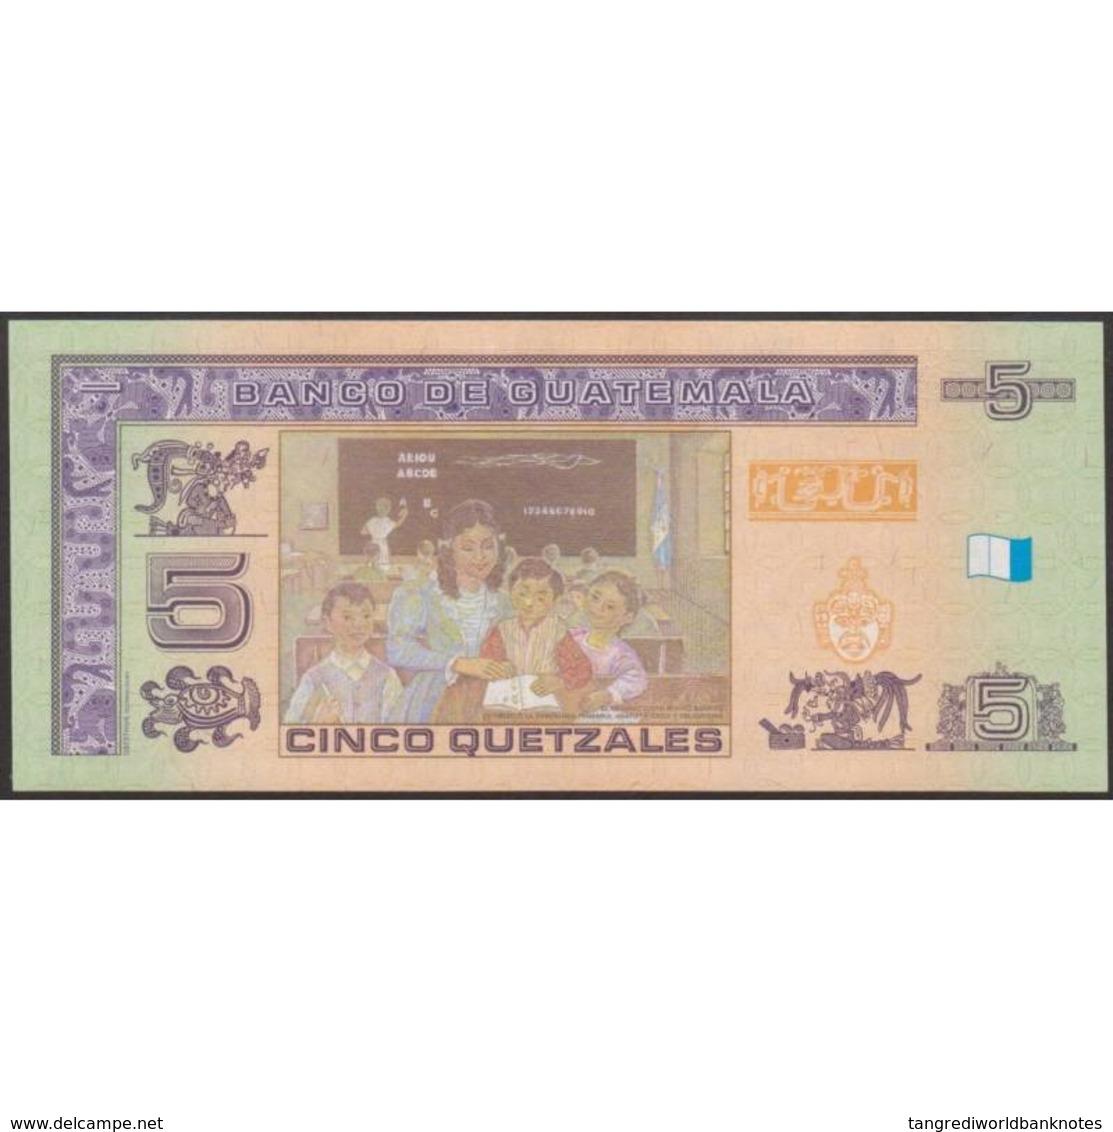 TWN - GUATEMALA 116 - 5 Quetzales 12.3.2008 C XXXXXXX D - Printer: OBERTHUR TECHNOLOGIES UNC - Guatemala